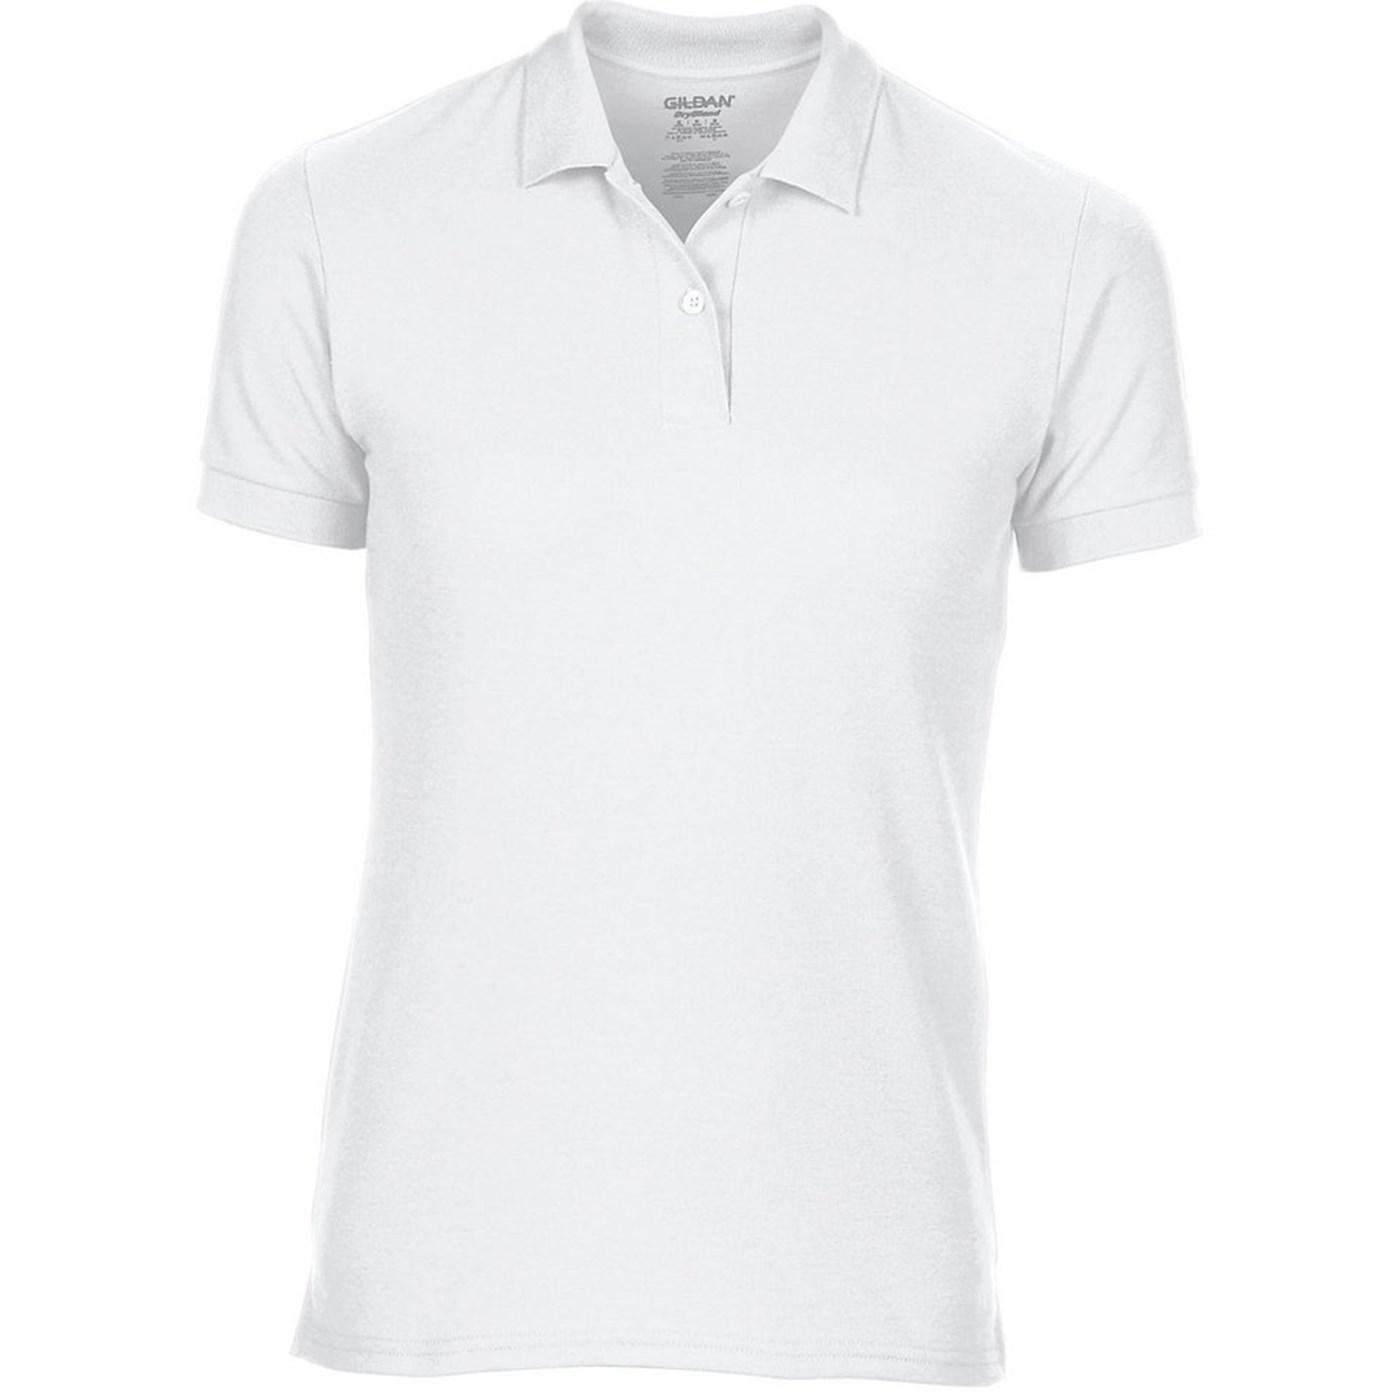 c30910b8619c08 Gildan Women's DryBlend Technology Semi Fitted Sports Polo Shirt GD045